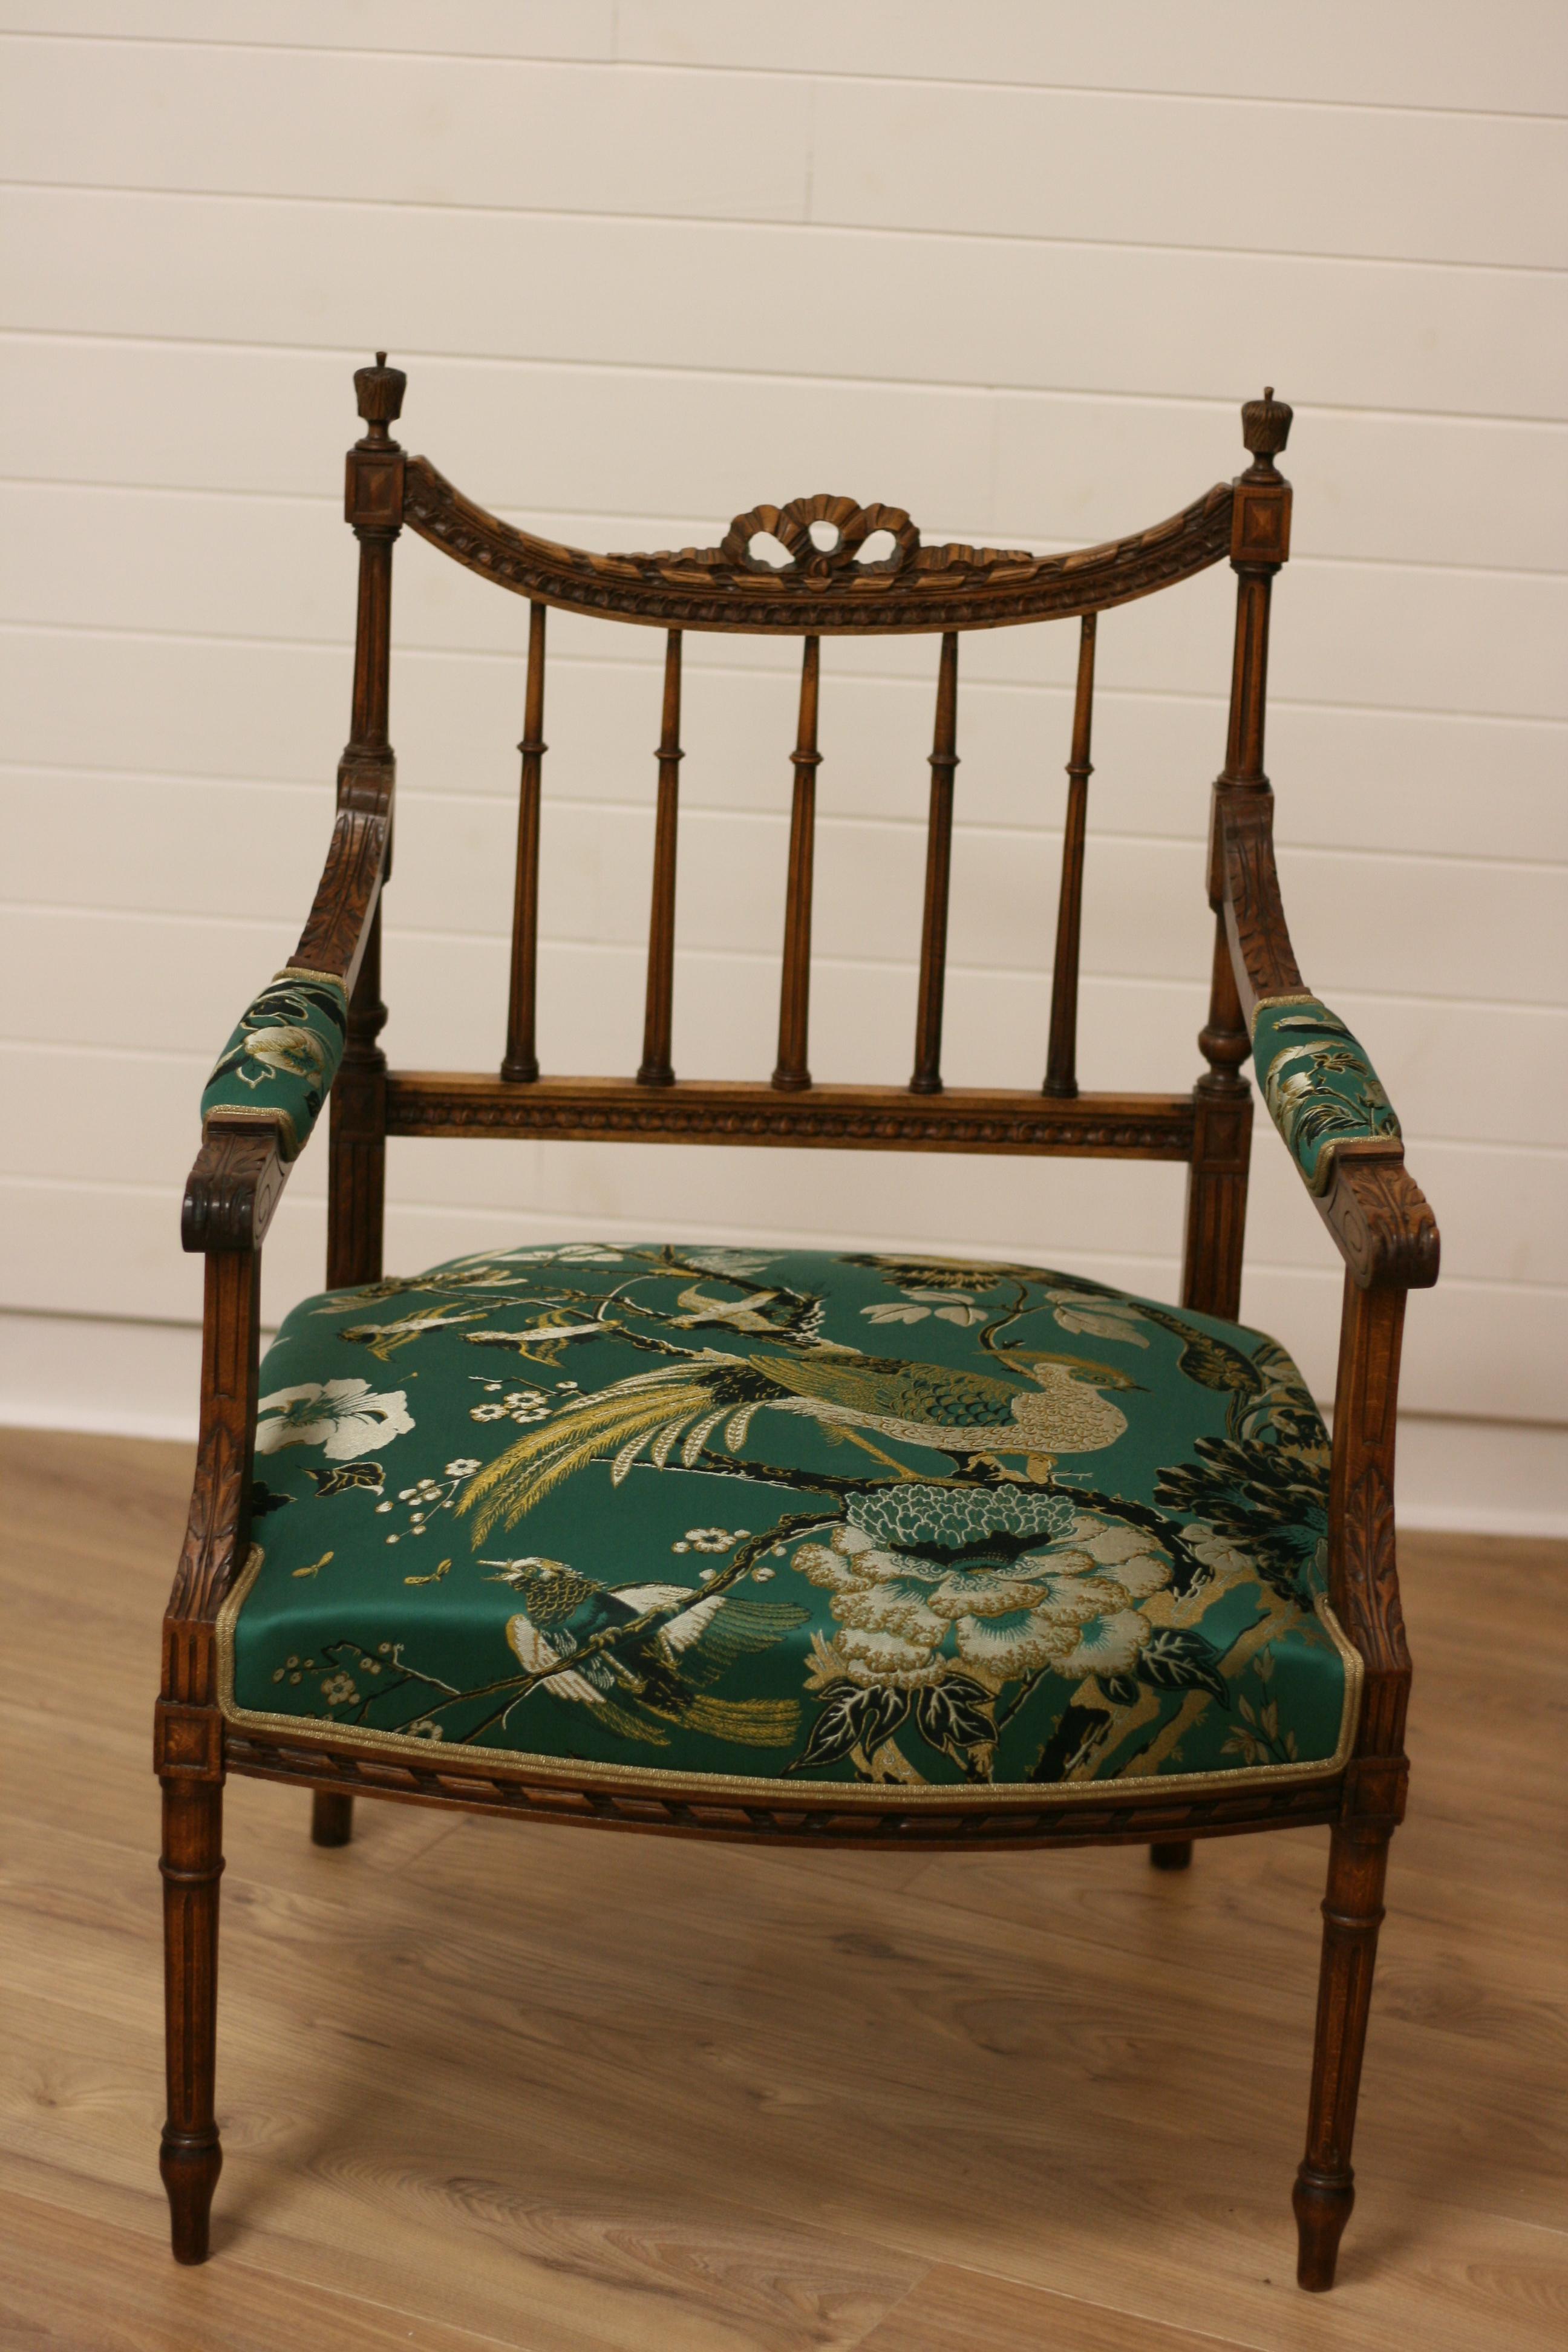 sandrine guyon tapissier fauteuil louis 16 tissu dedar 1 - Tapissier Fauteuil